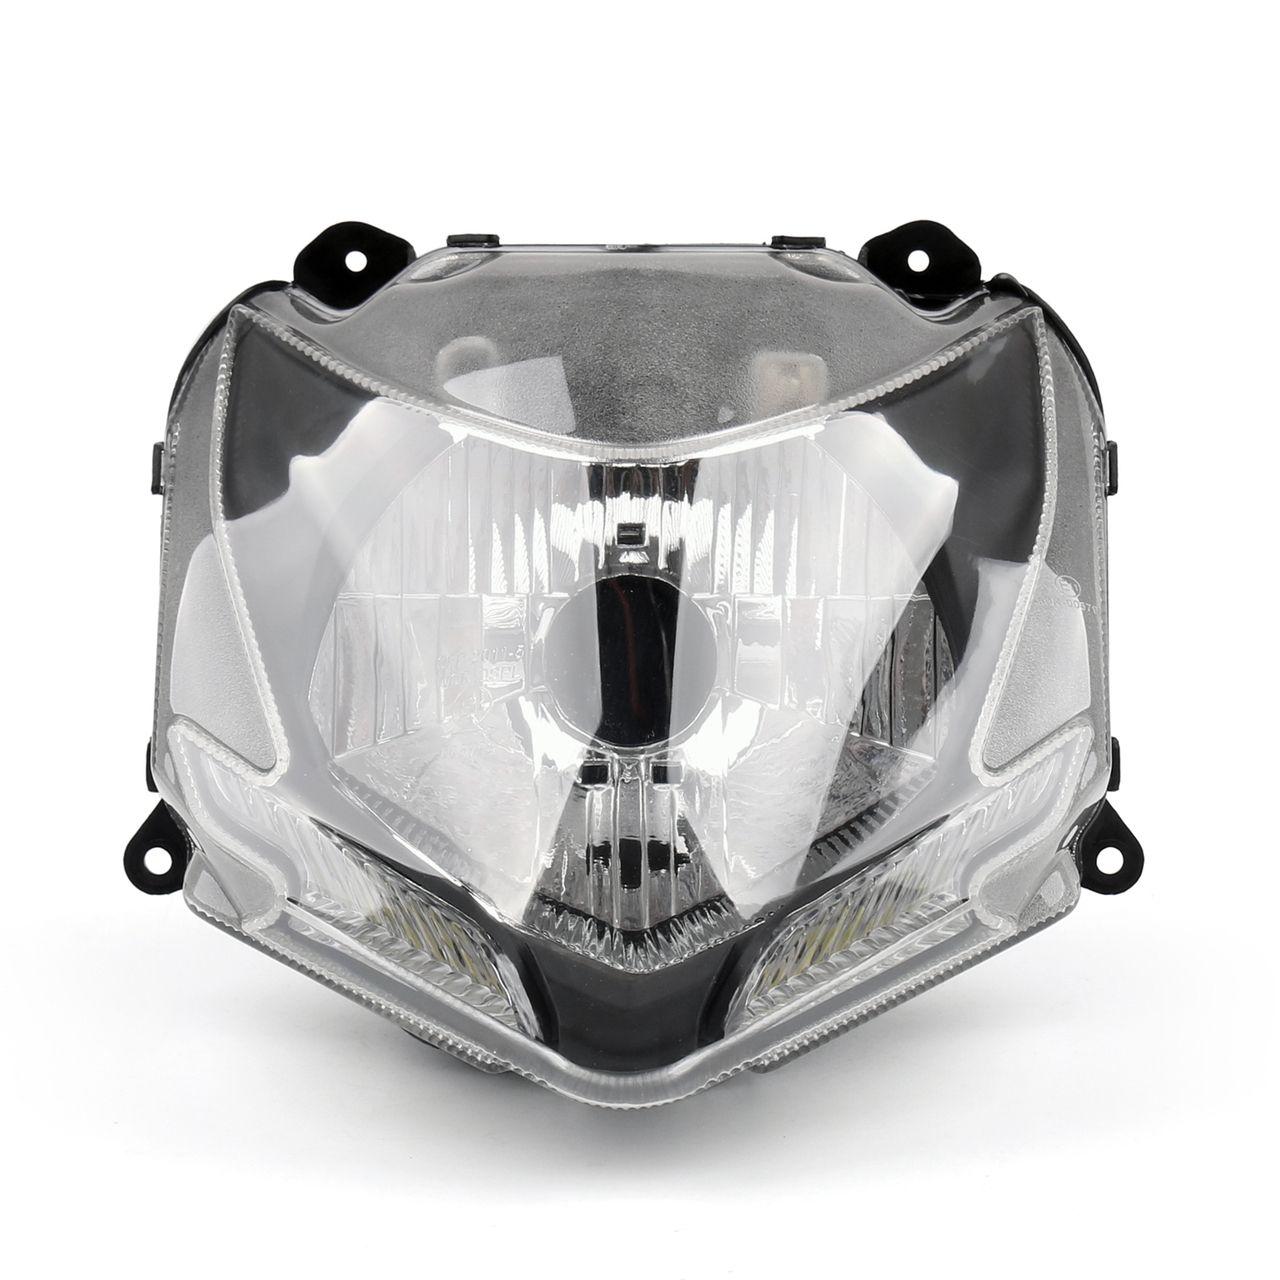 Headlight Head light Ducati 848 streetfighter (2009-2013 ...